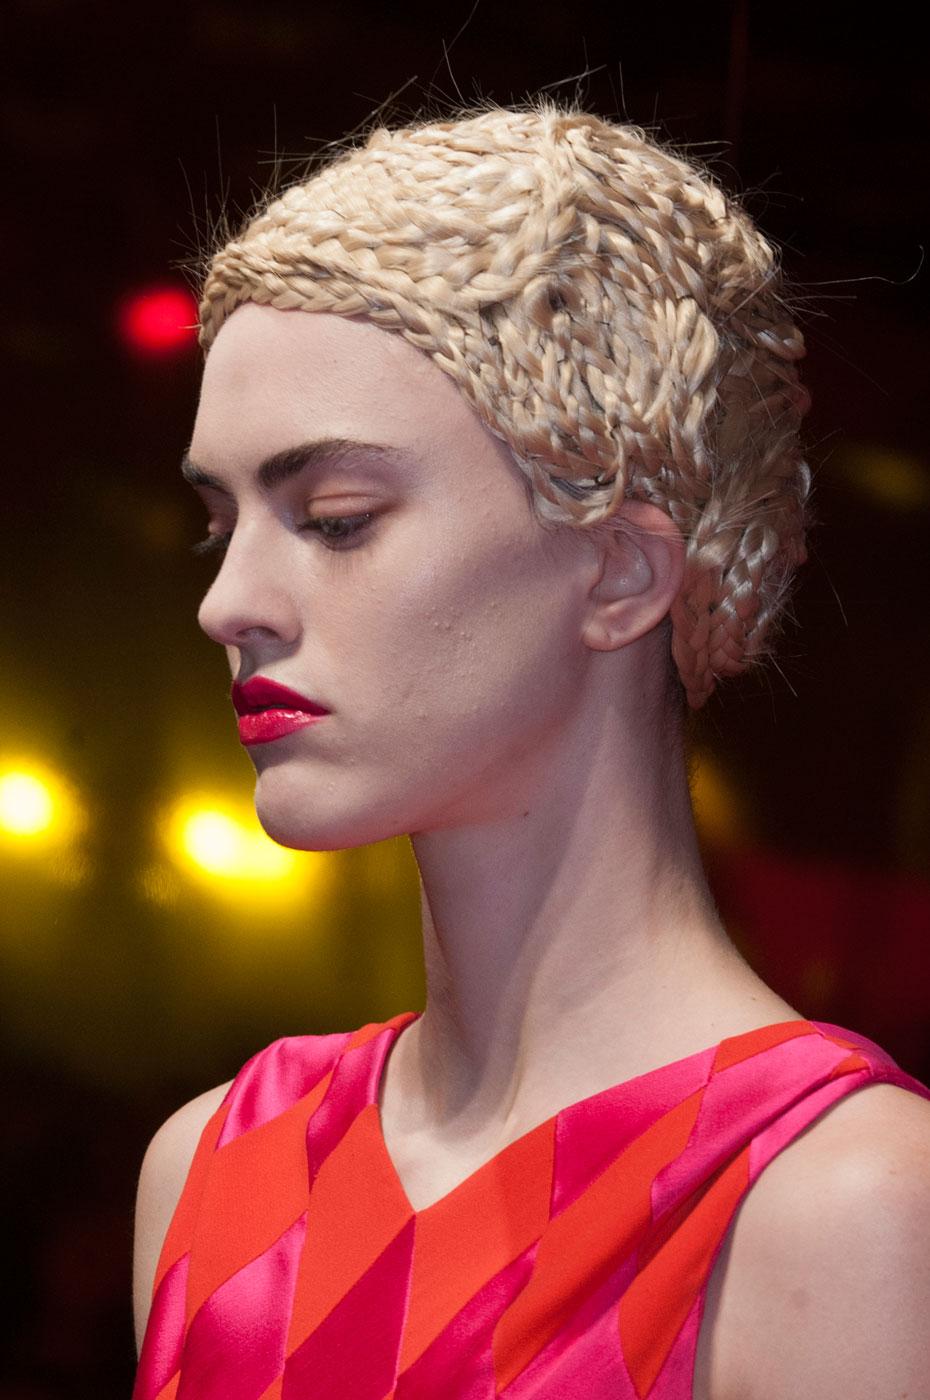 Schiaparelli-fashion-runway-show-close-ups-haute-couture-paris-spring-summer-2015-the-impression-37